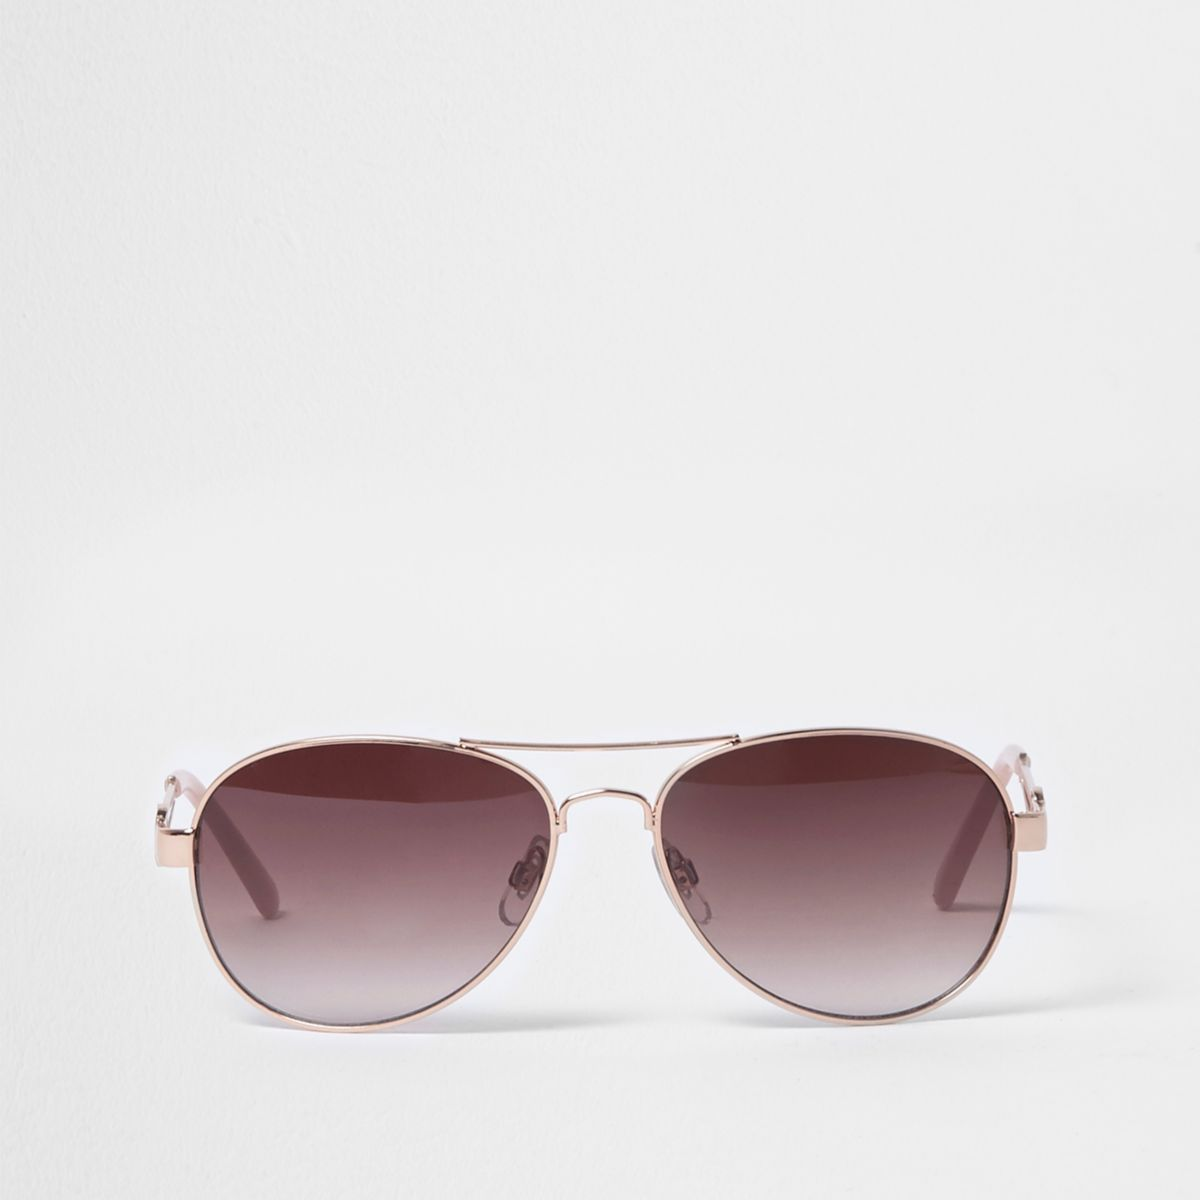 Rose gold tone aviator sunglasses